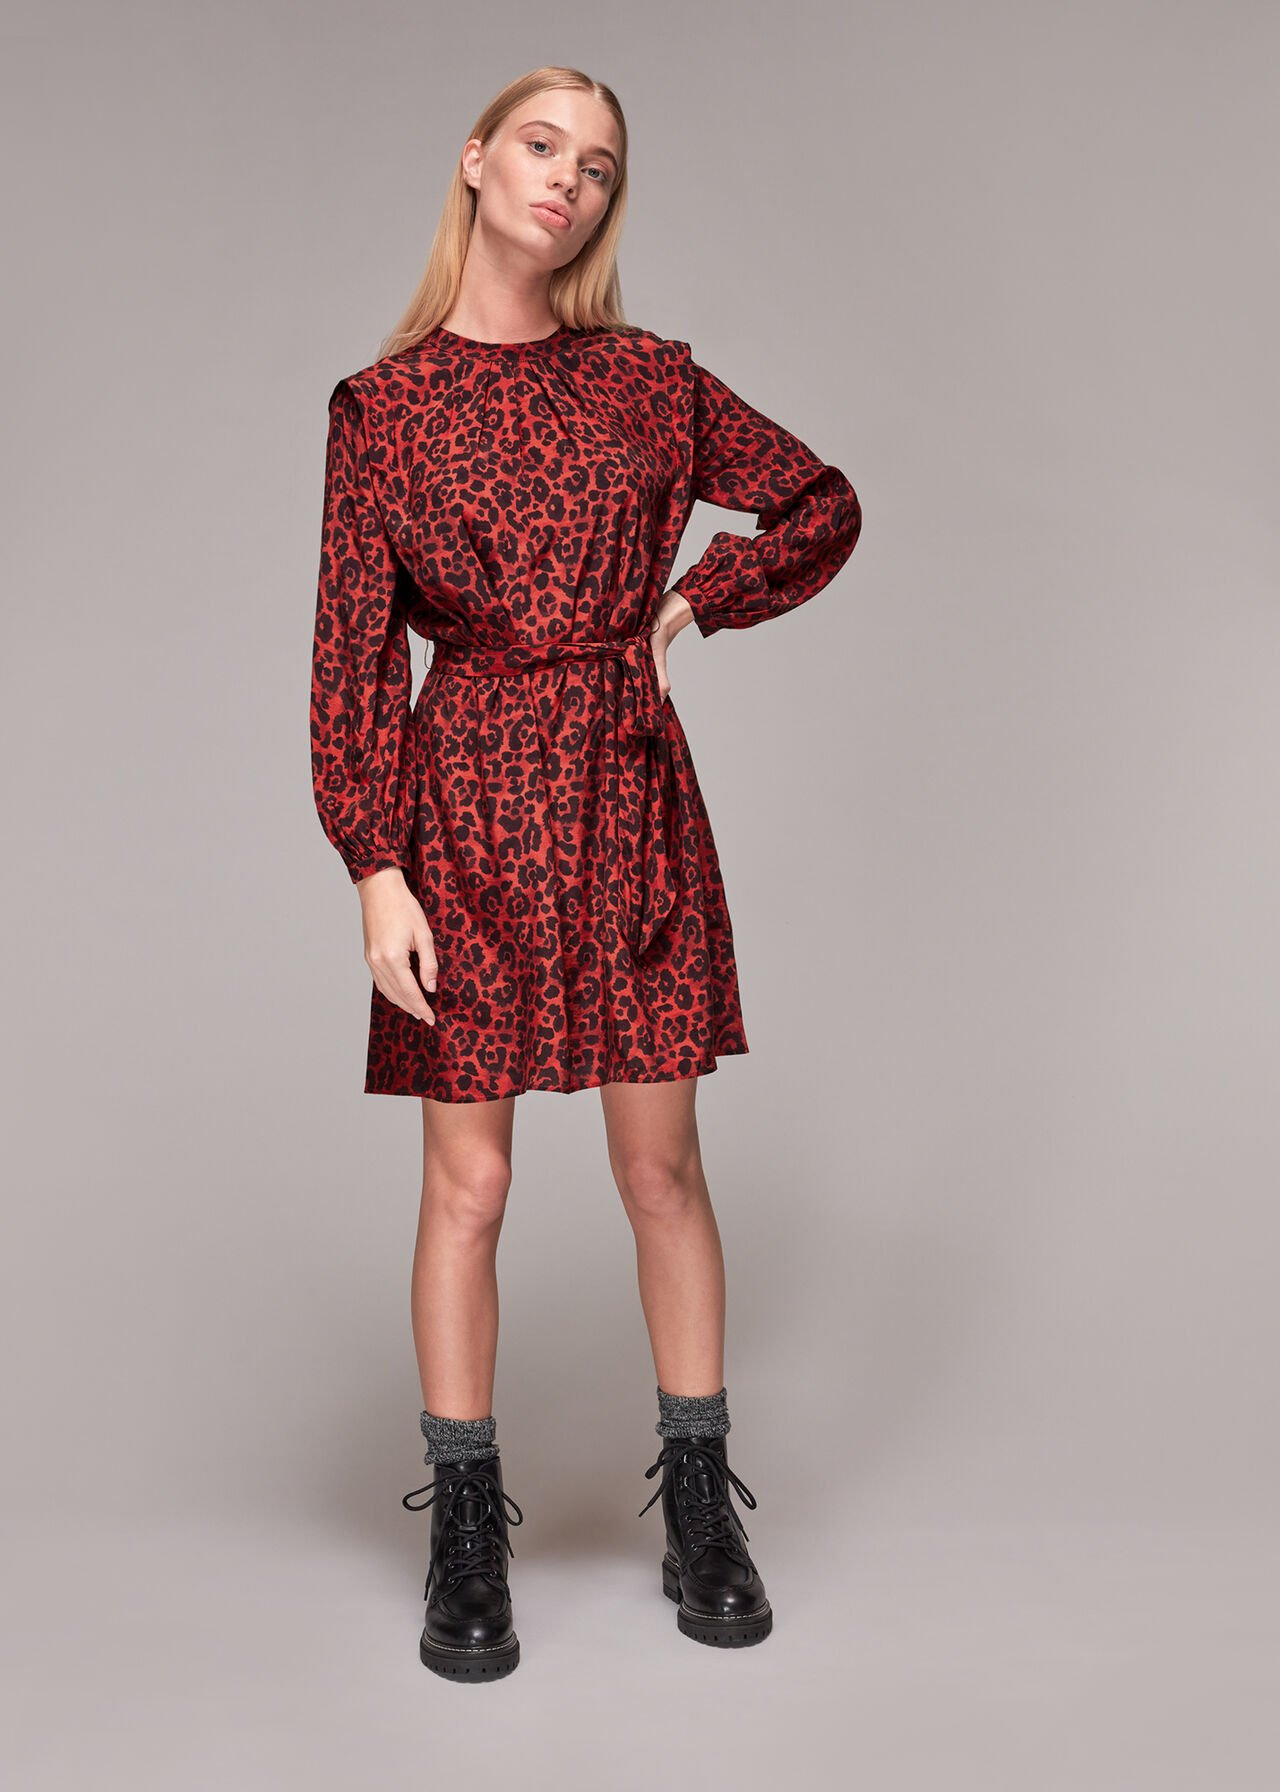 Animal Print Belted Dress